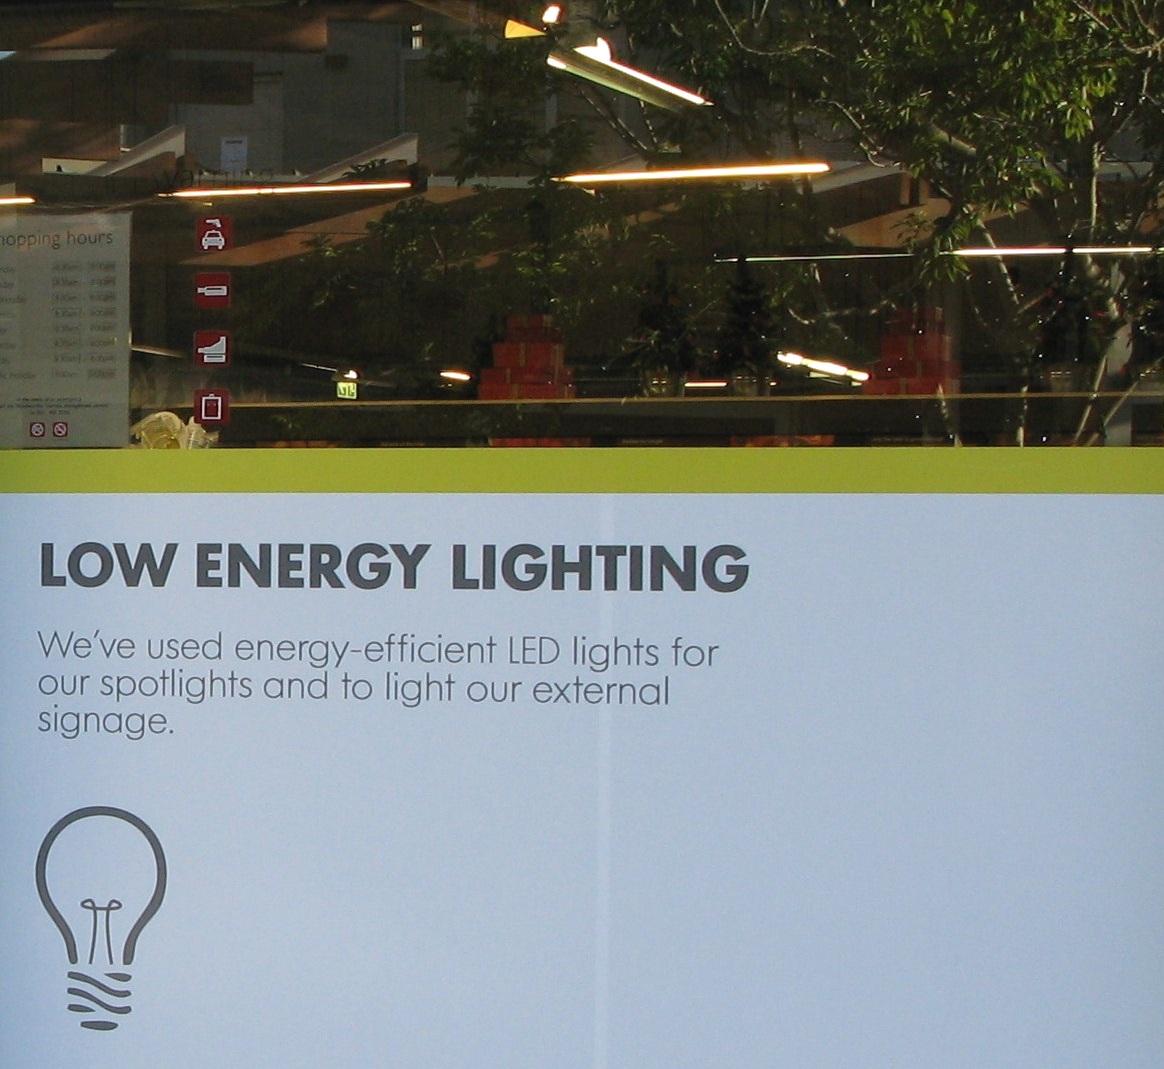 woolworths customers - low energy lighting